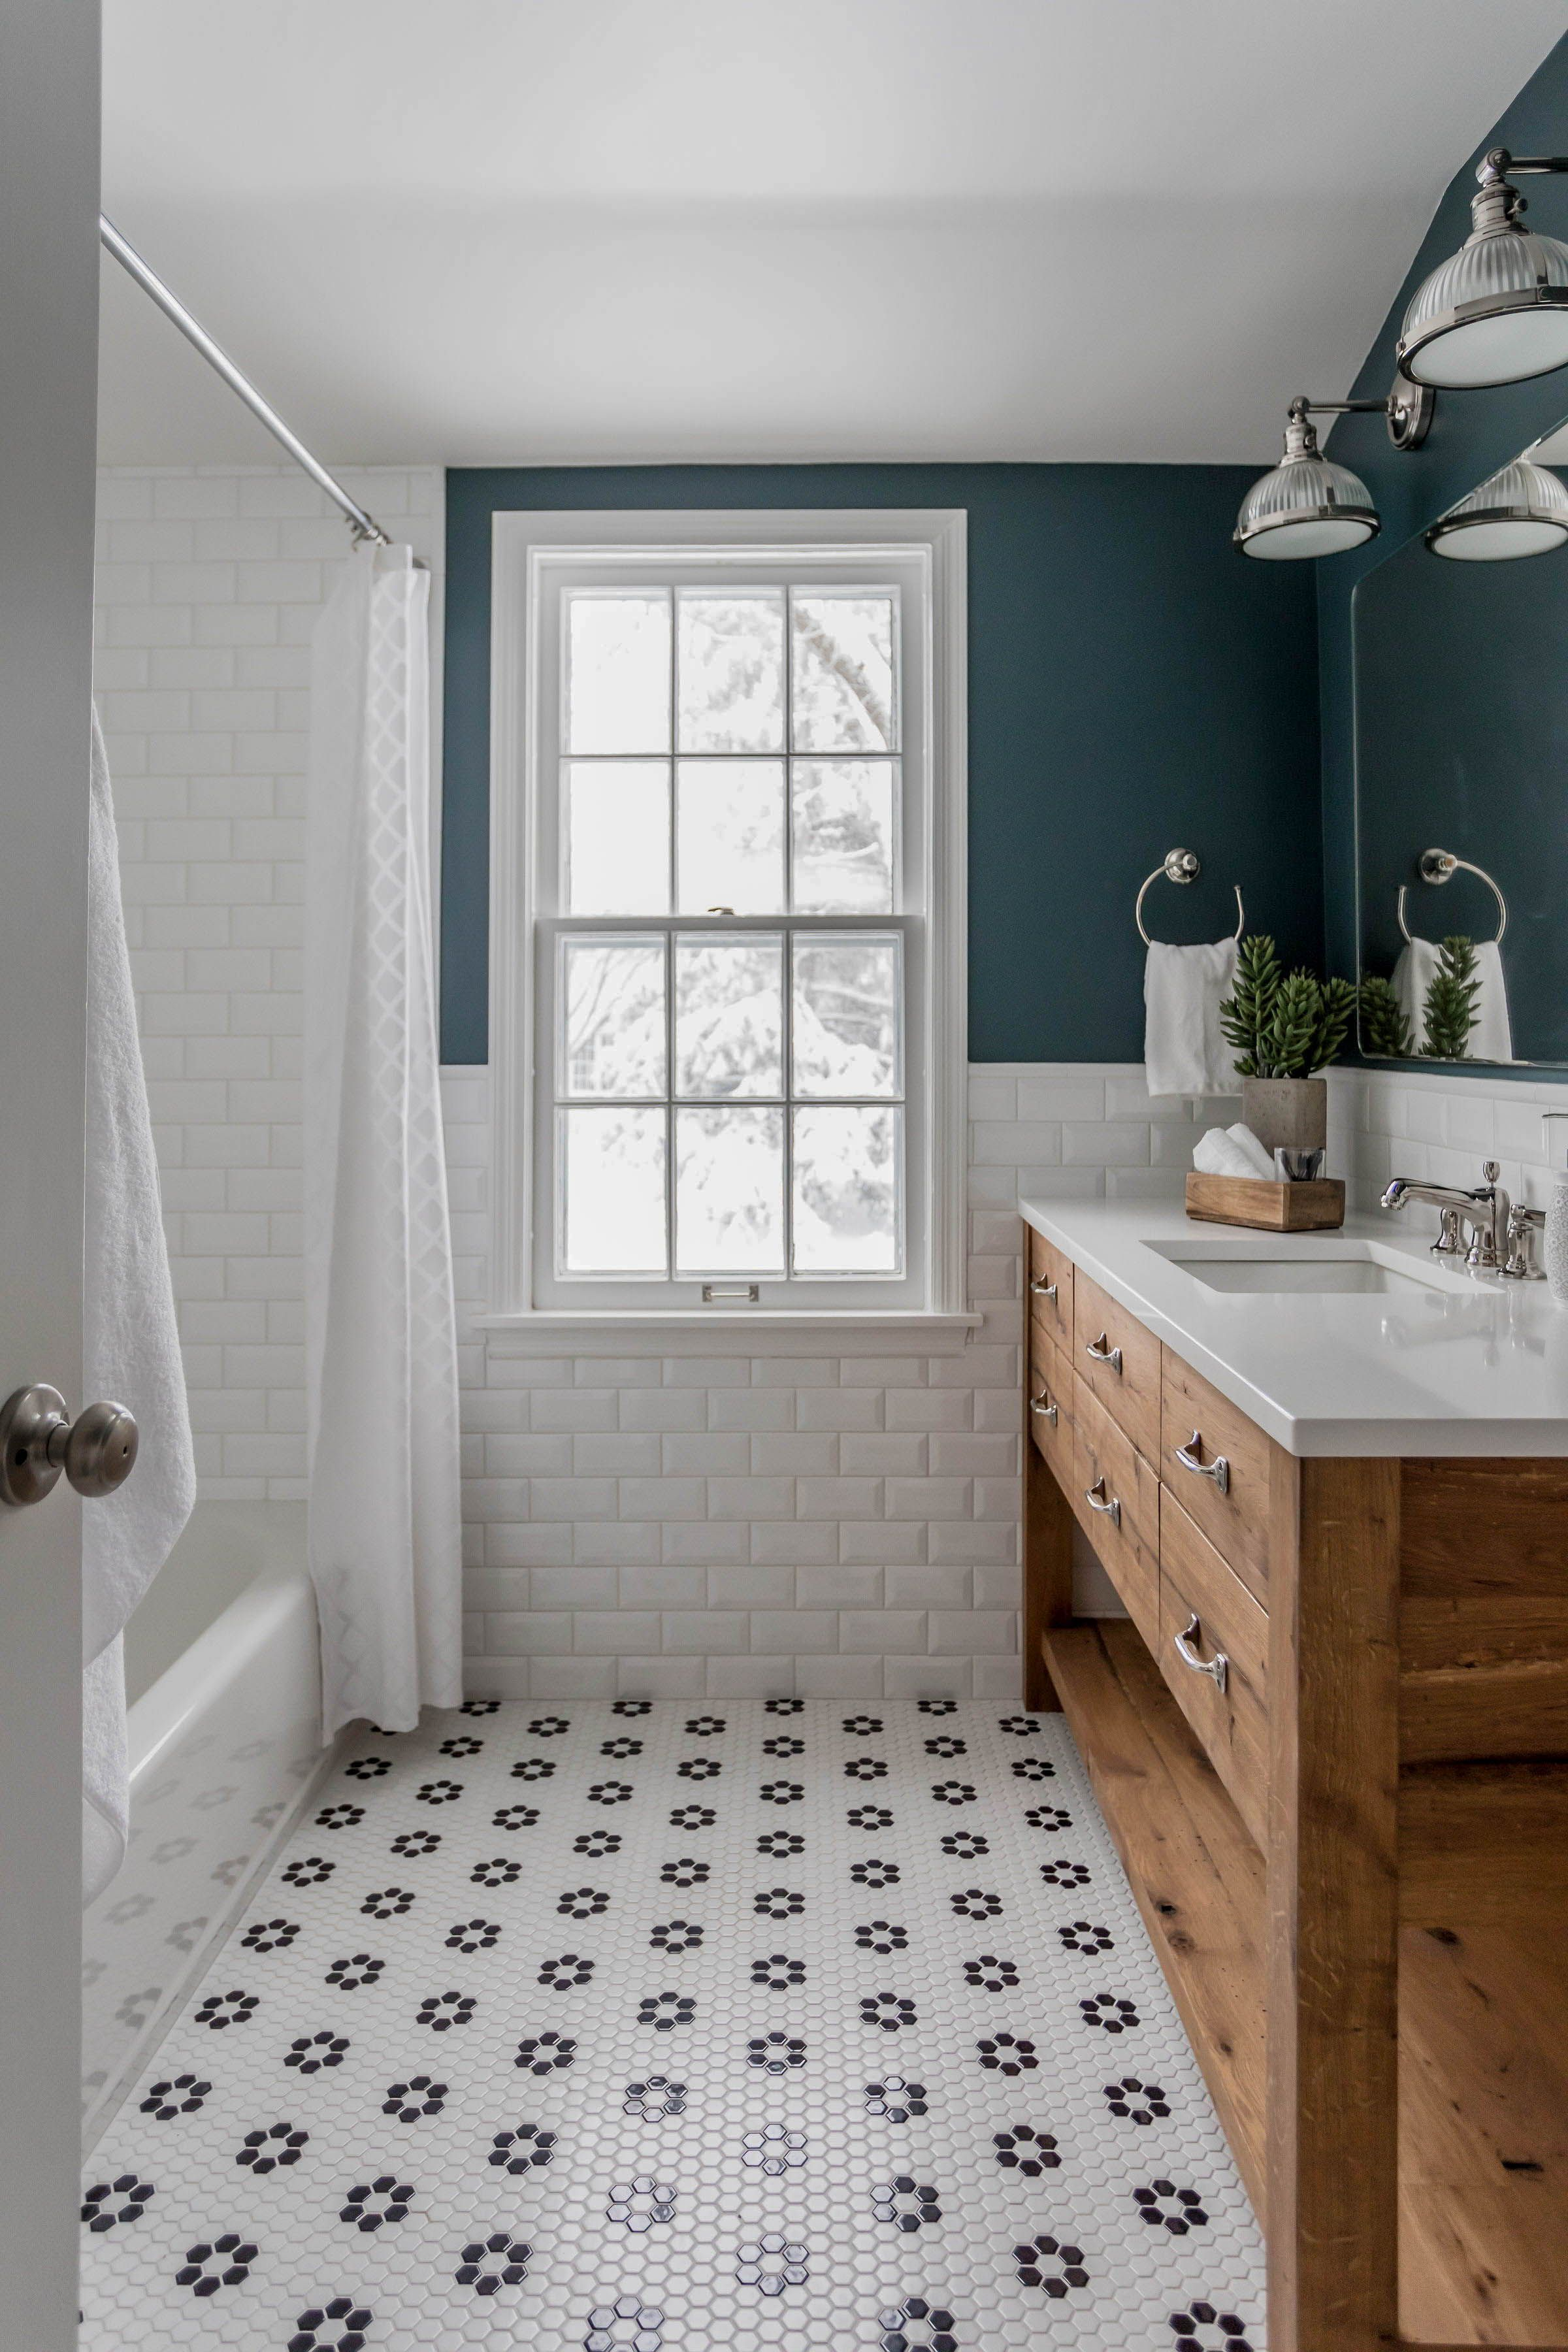 Reclaimed wood vanity, black and white tile, subway tile, dark green bathroom walls.